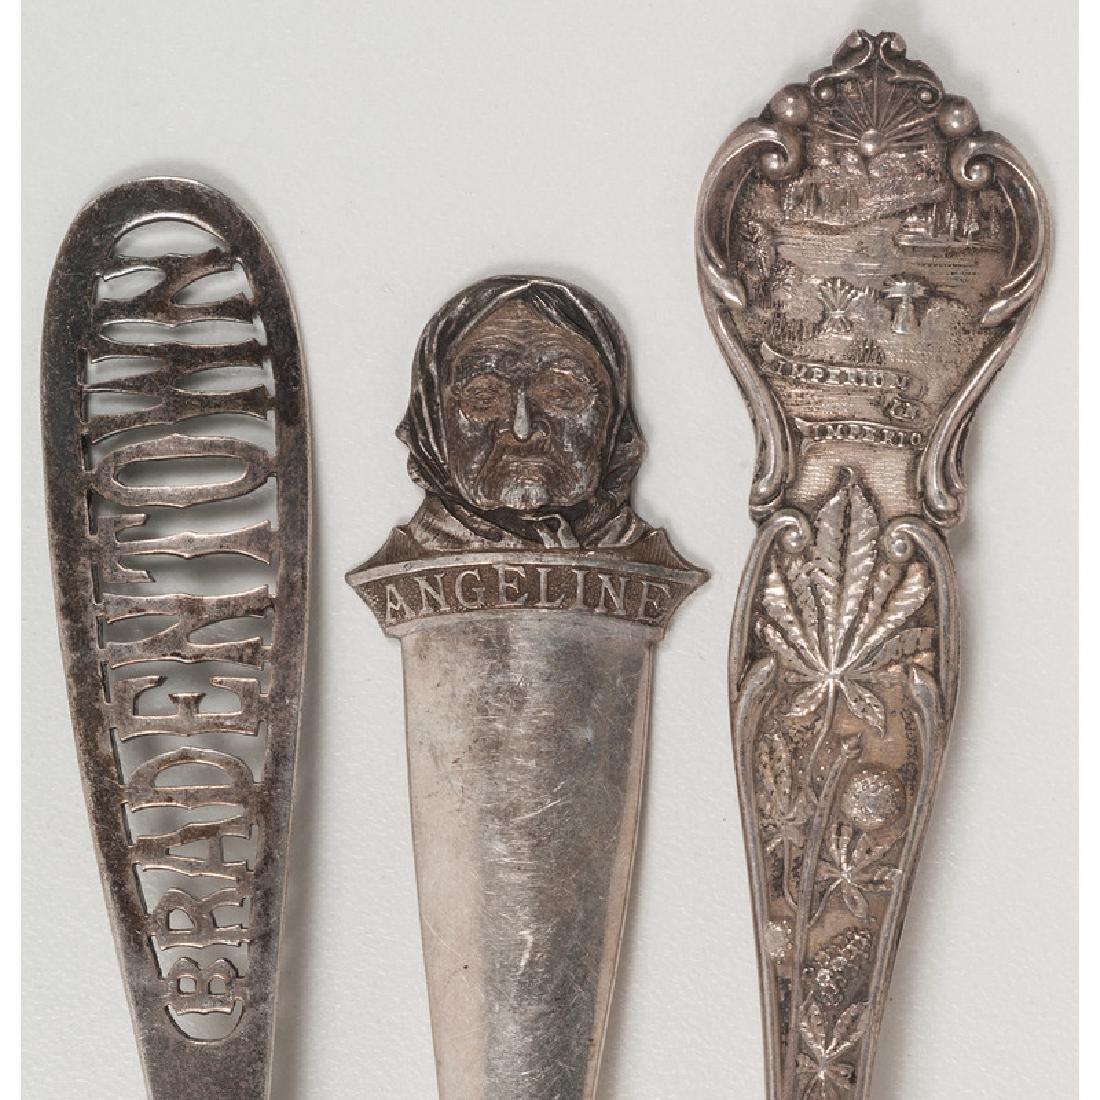 American Sterling Silver Souvenir Spoons - 7